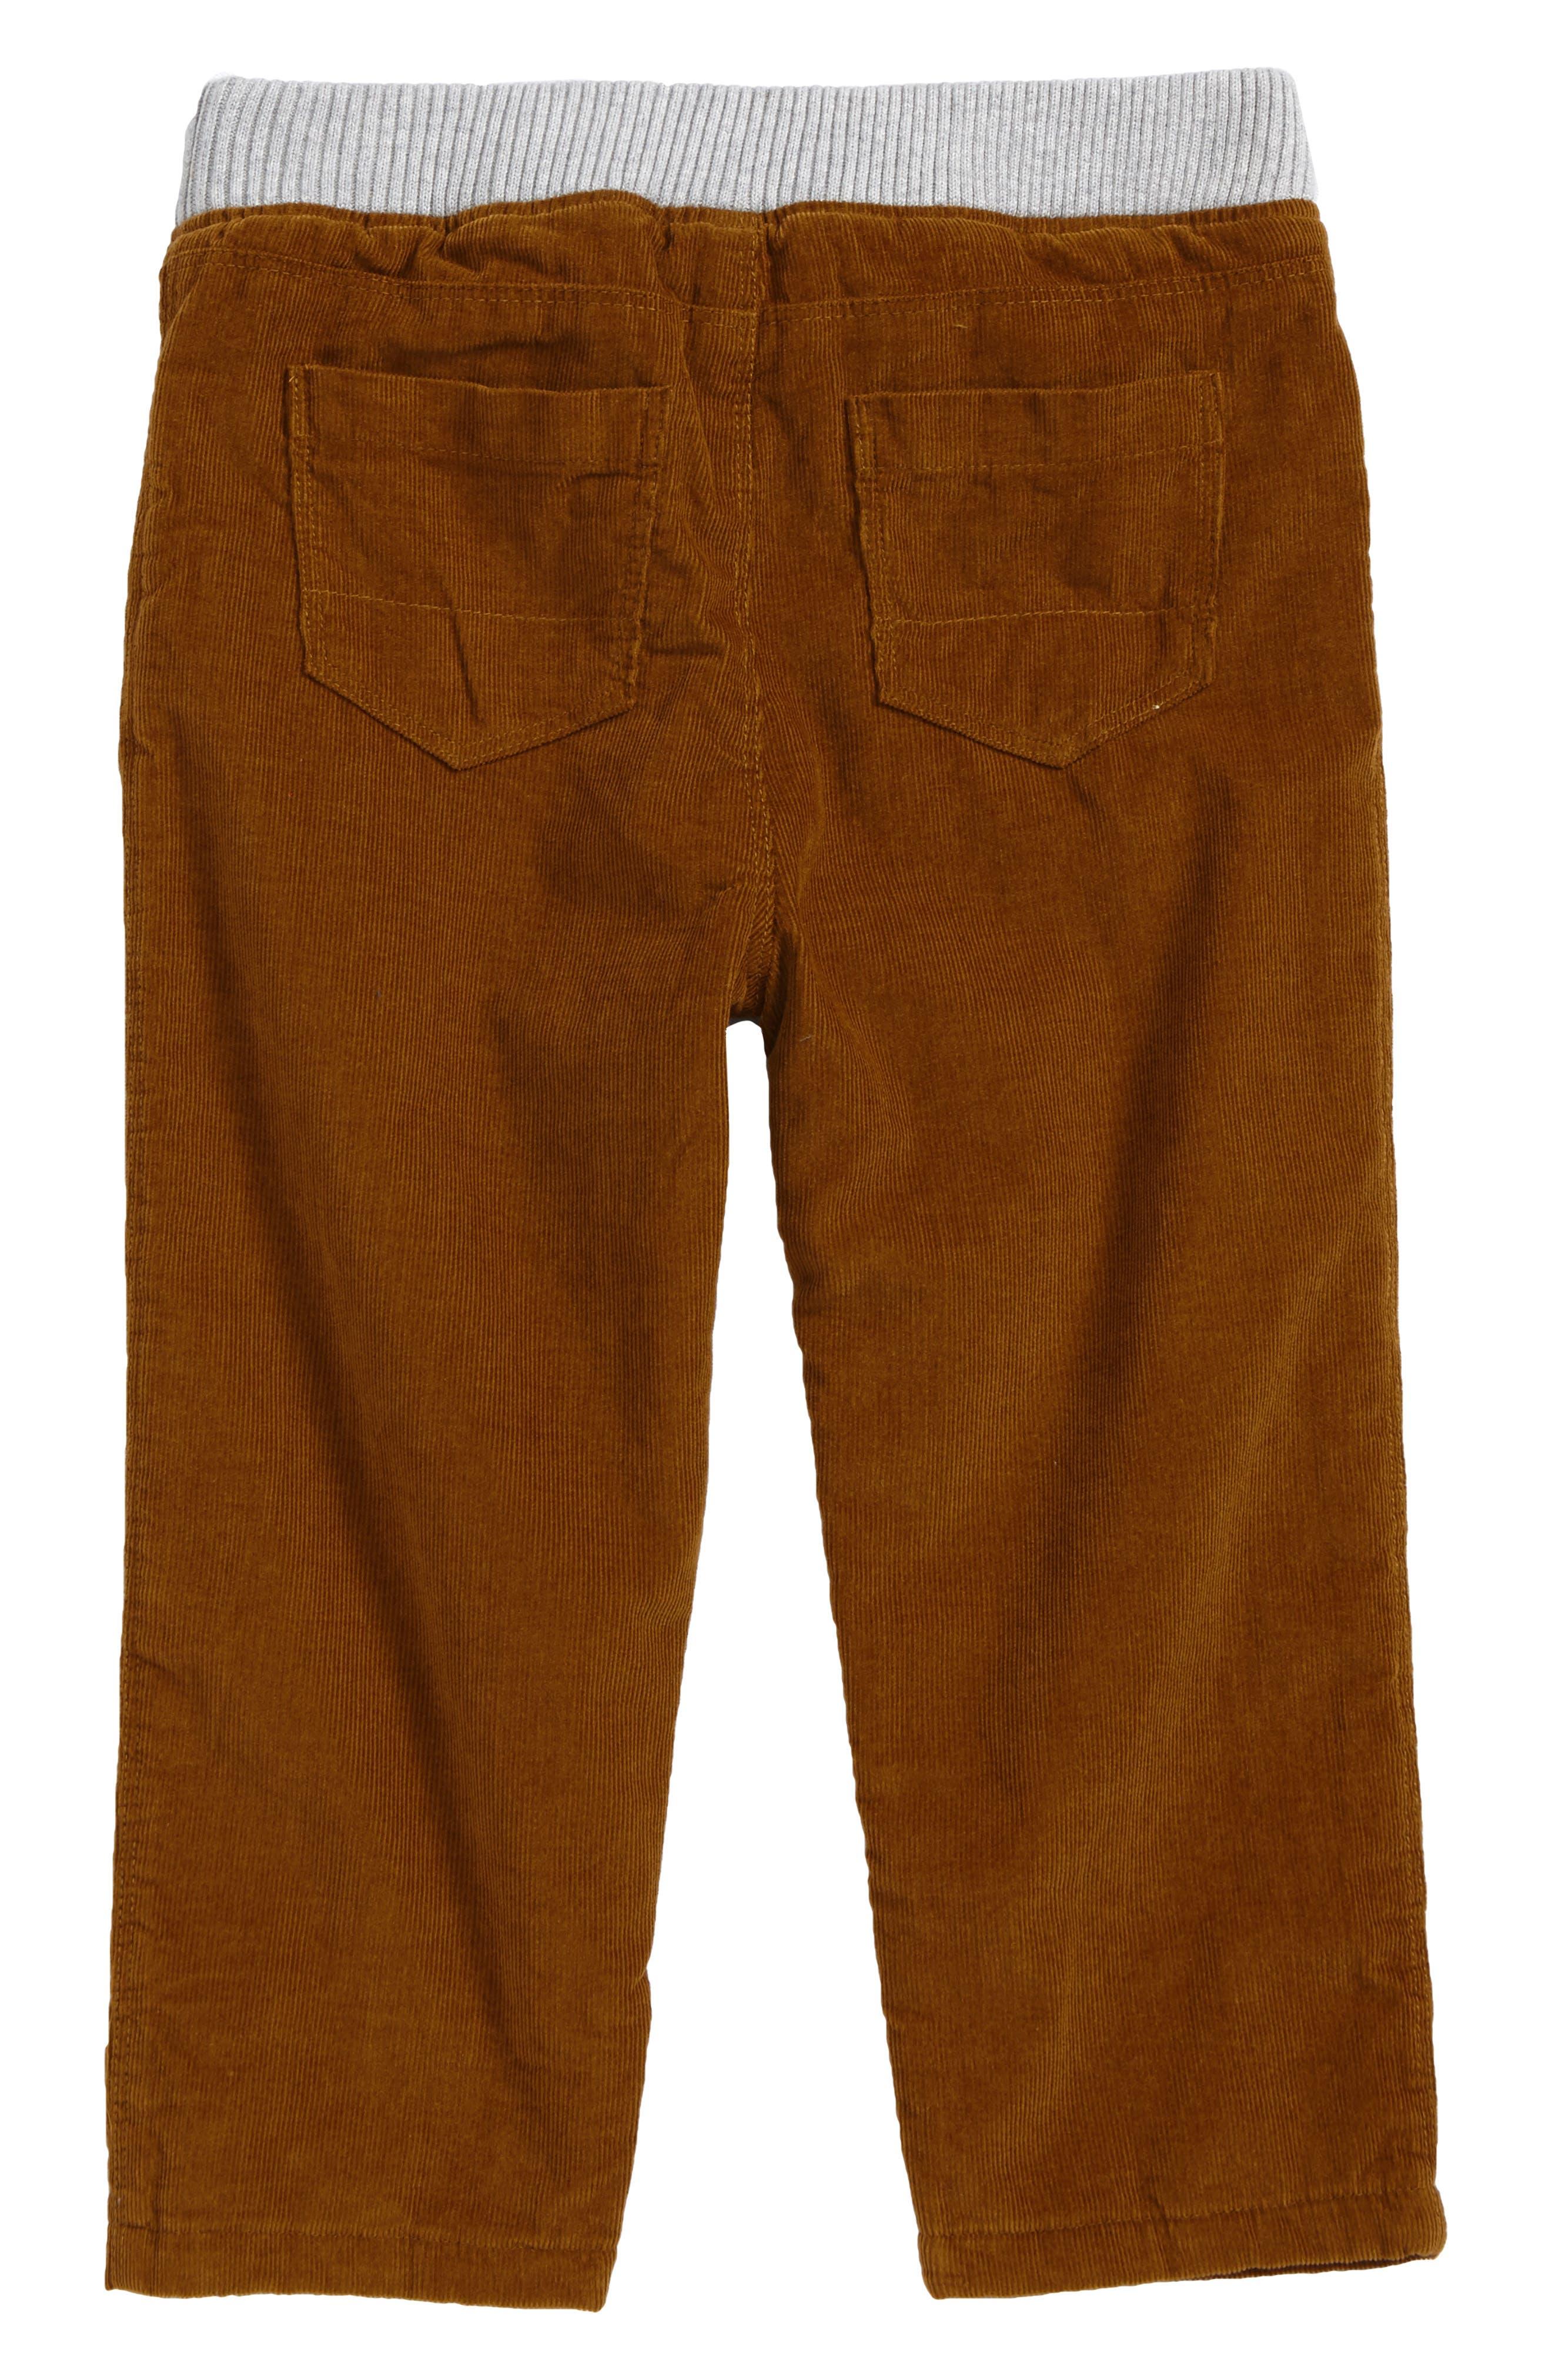 Alternate Image 2  - Tucker + Tate Corduroy Pants (Baby Boys)